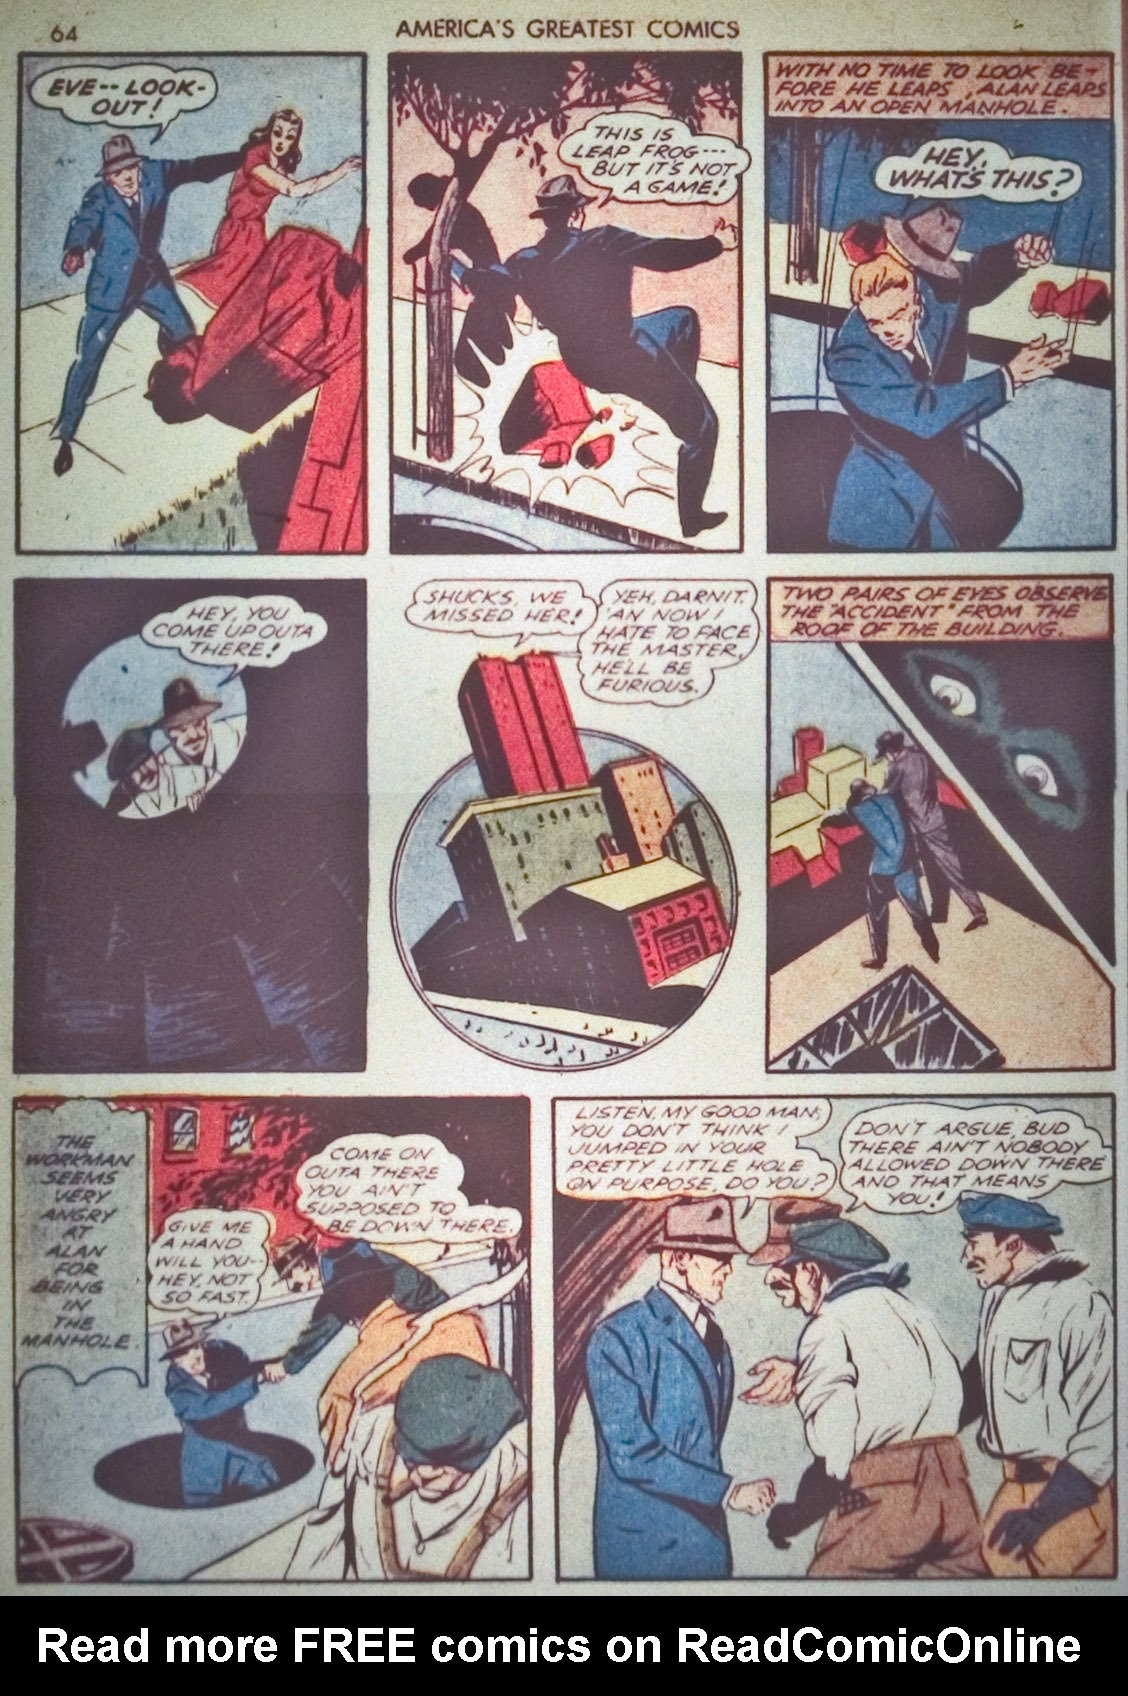 Read online America's Greatest Comics comic -  Issue #1 - 67